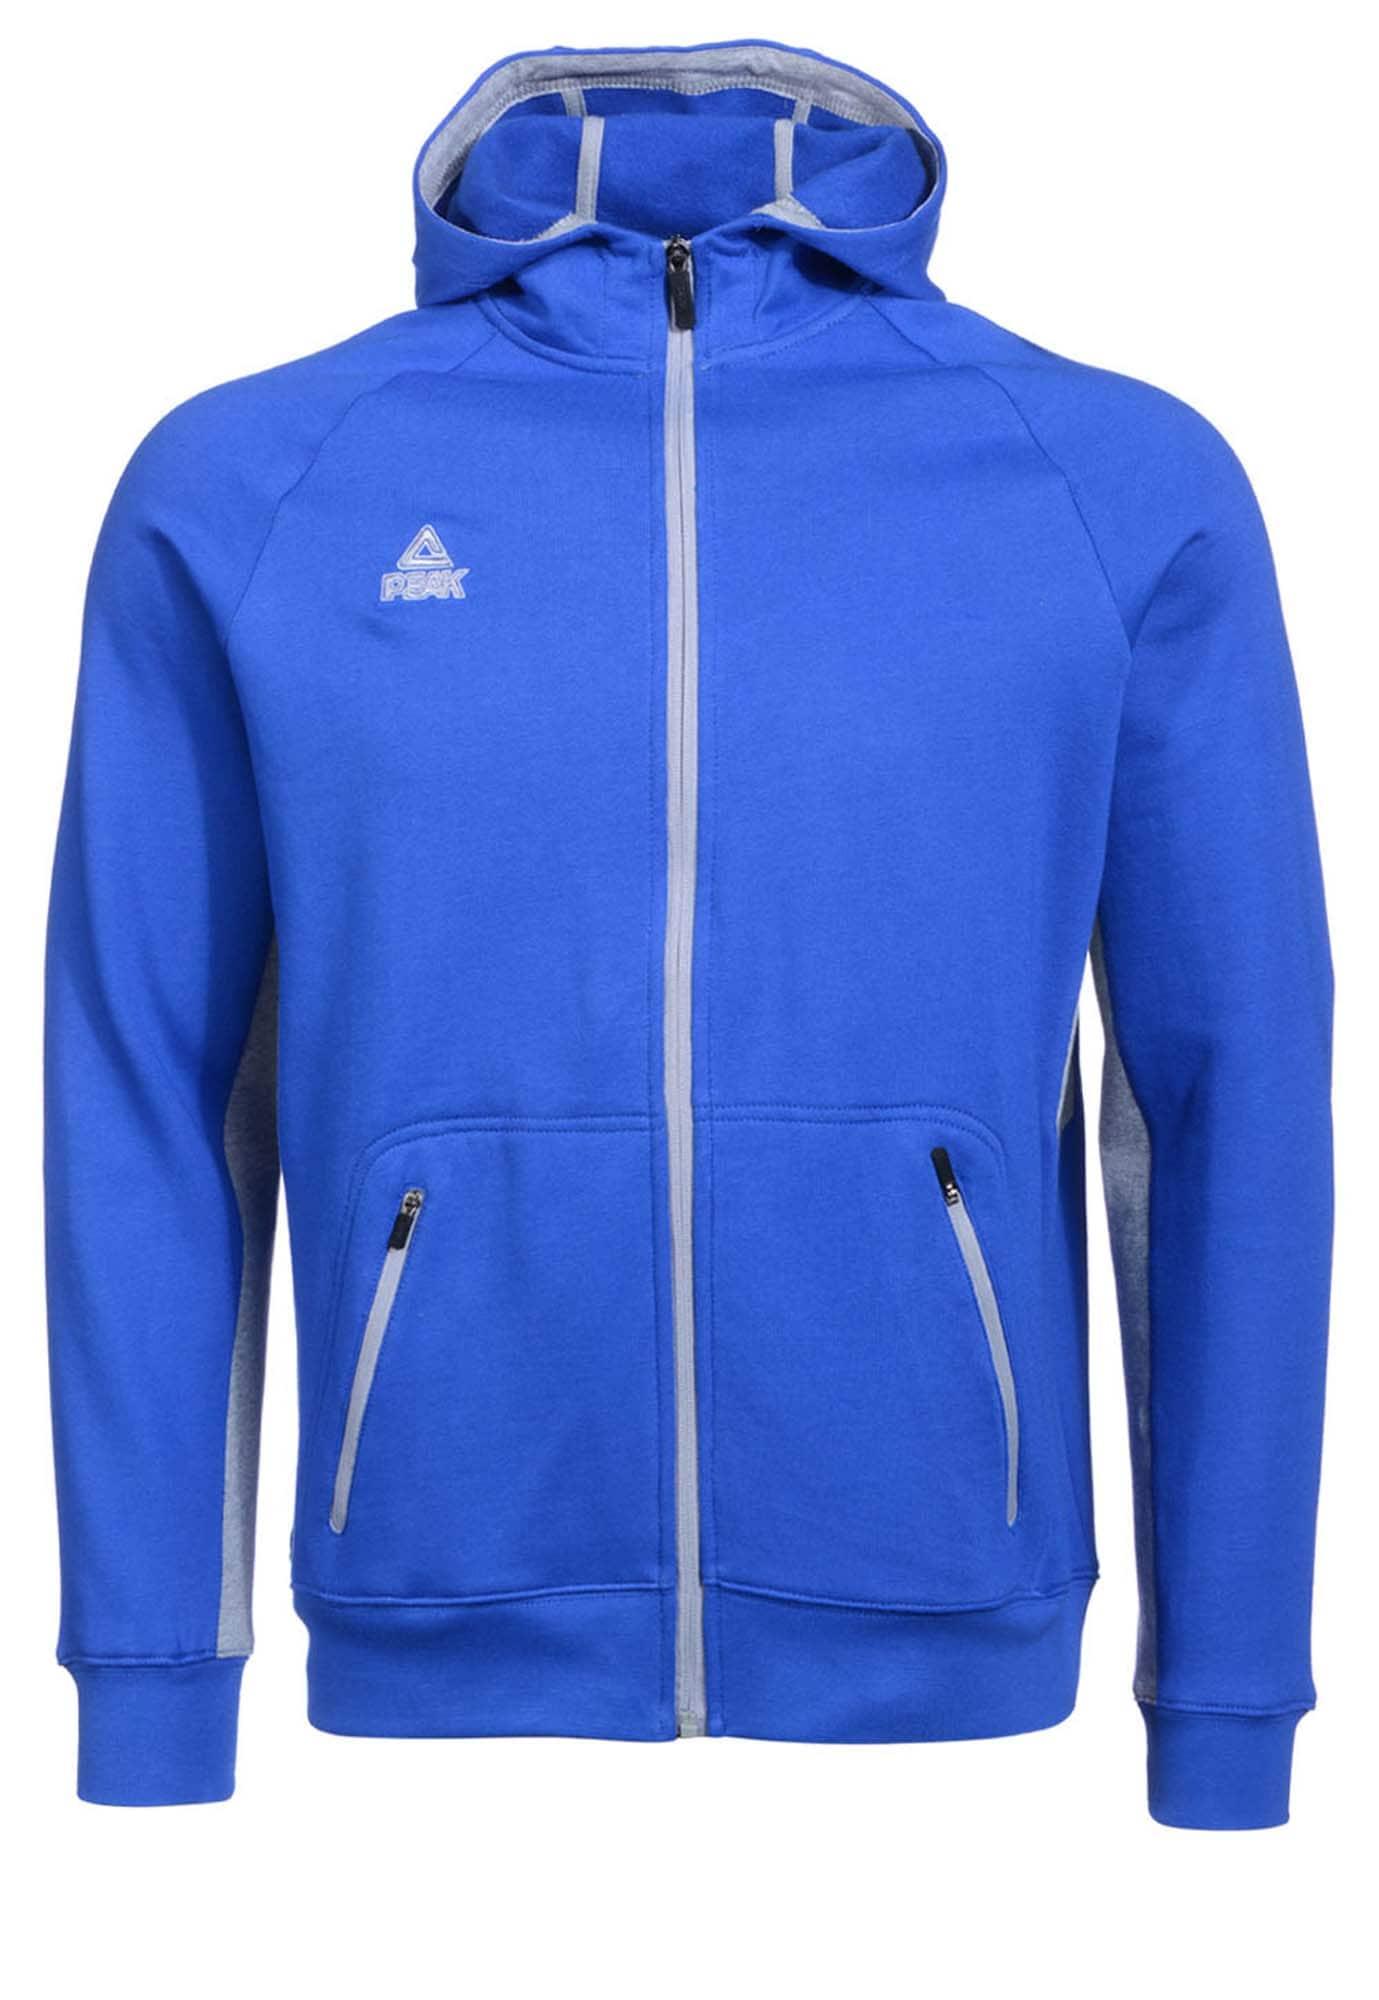 Zip Hoody | Bekleidung > Sweatshirts & -jacken > Zip-Hoodies | Peak